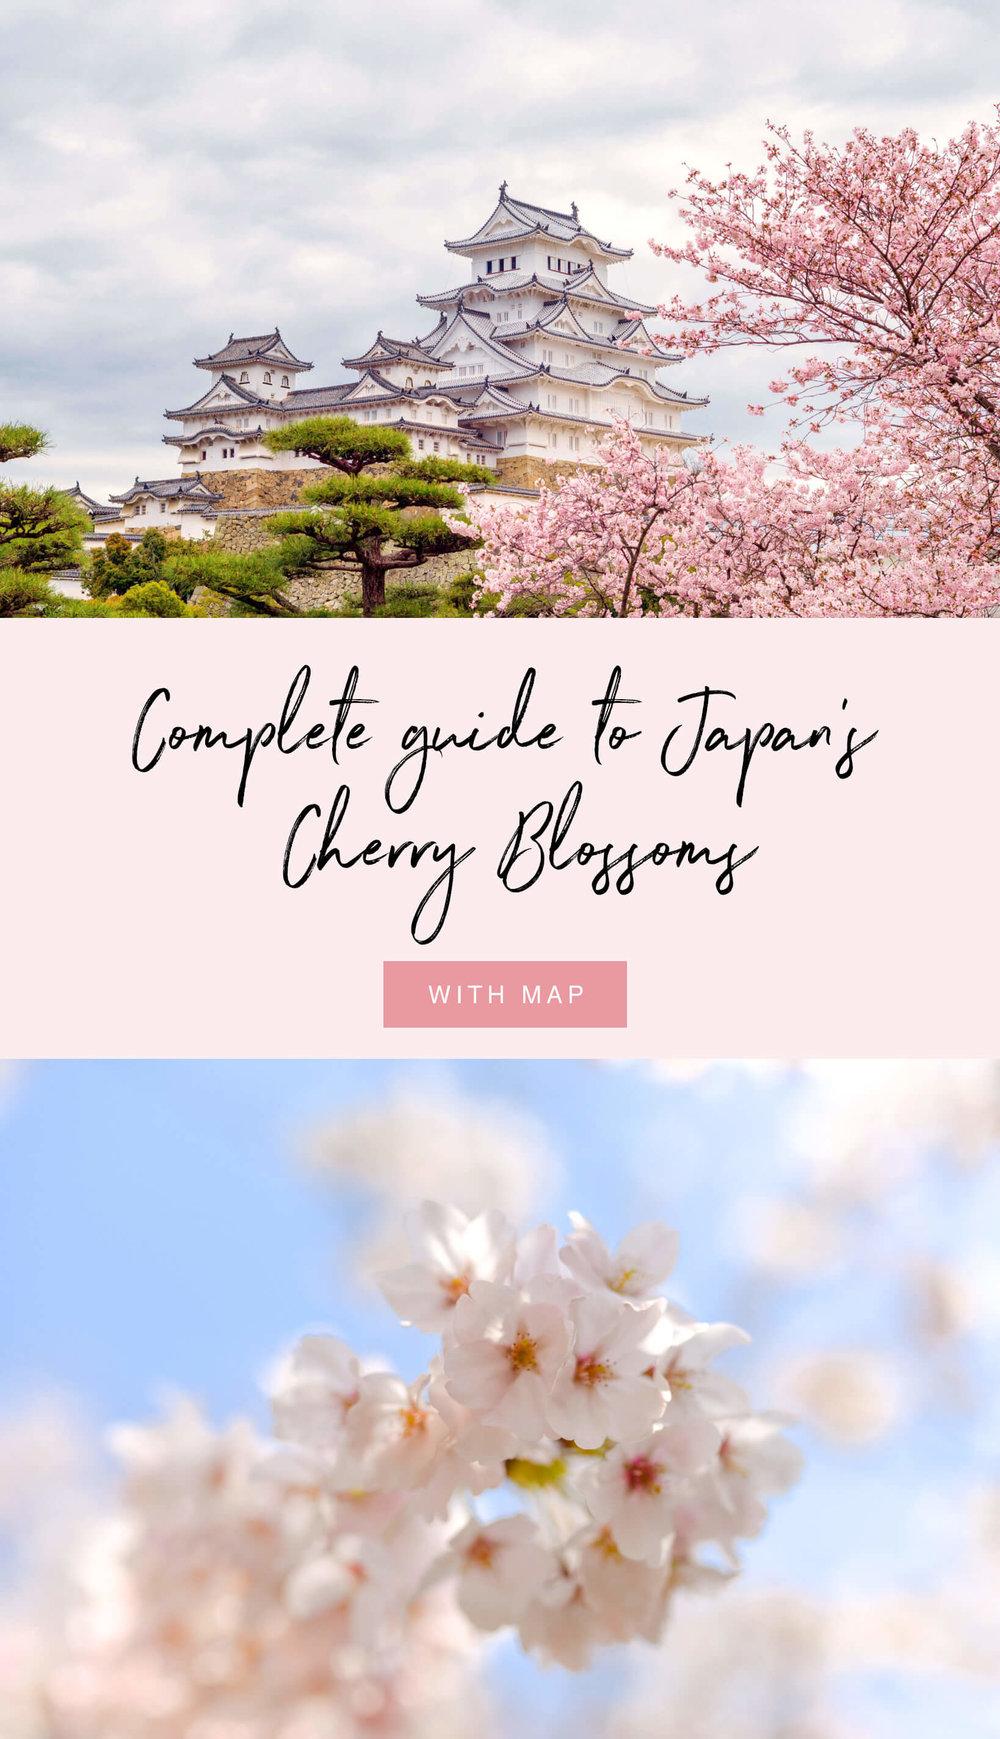 CompleteGuideToJapansCherryBlossomsWithMap.jpg